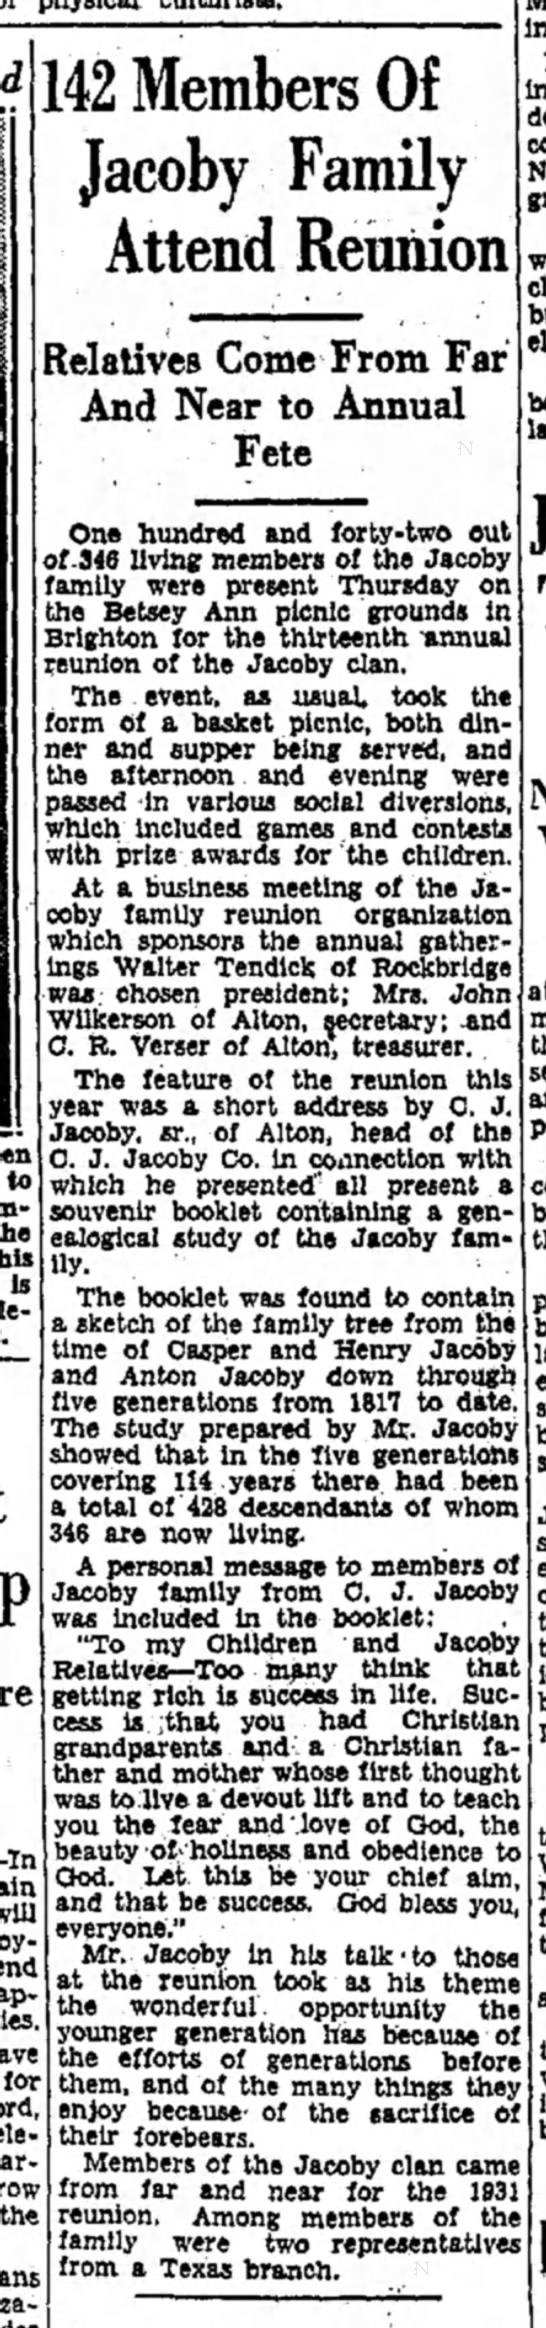 Anton JacobyAugust 21, 1931